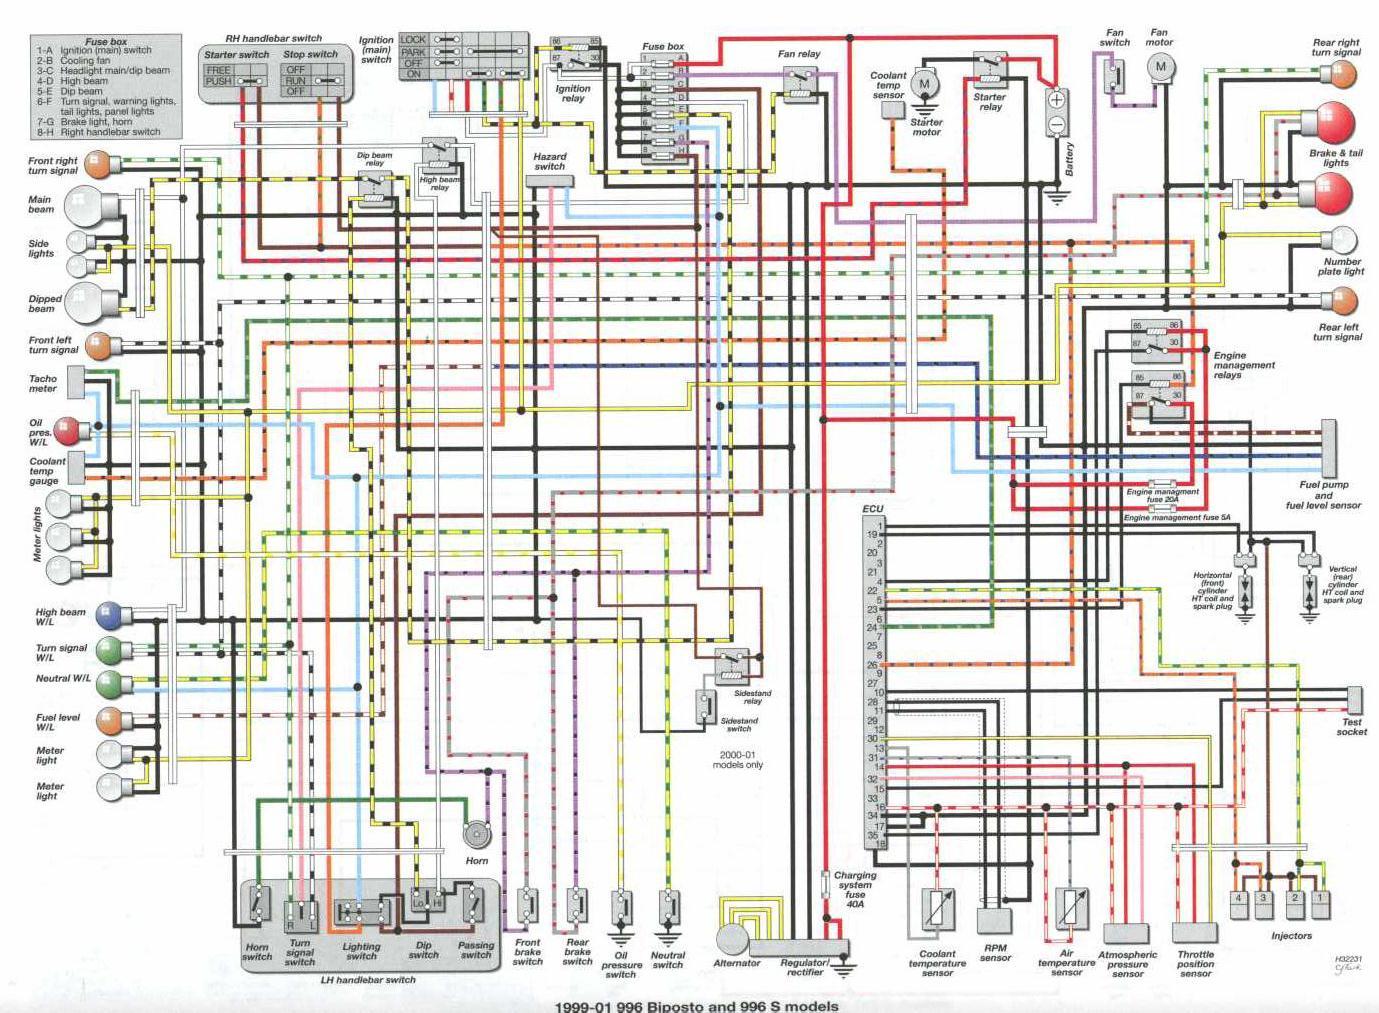 Terrific Ducati 999 Ecu Wiring Basic Electronics Wiring Diagram Wiring Digital Resources Instshebarightsorg